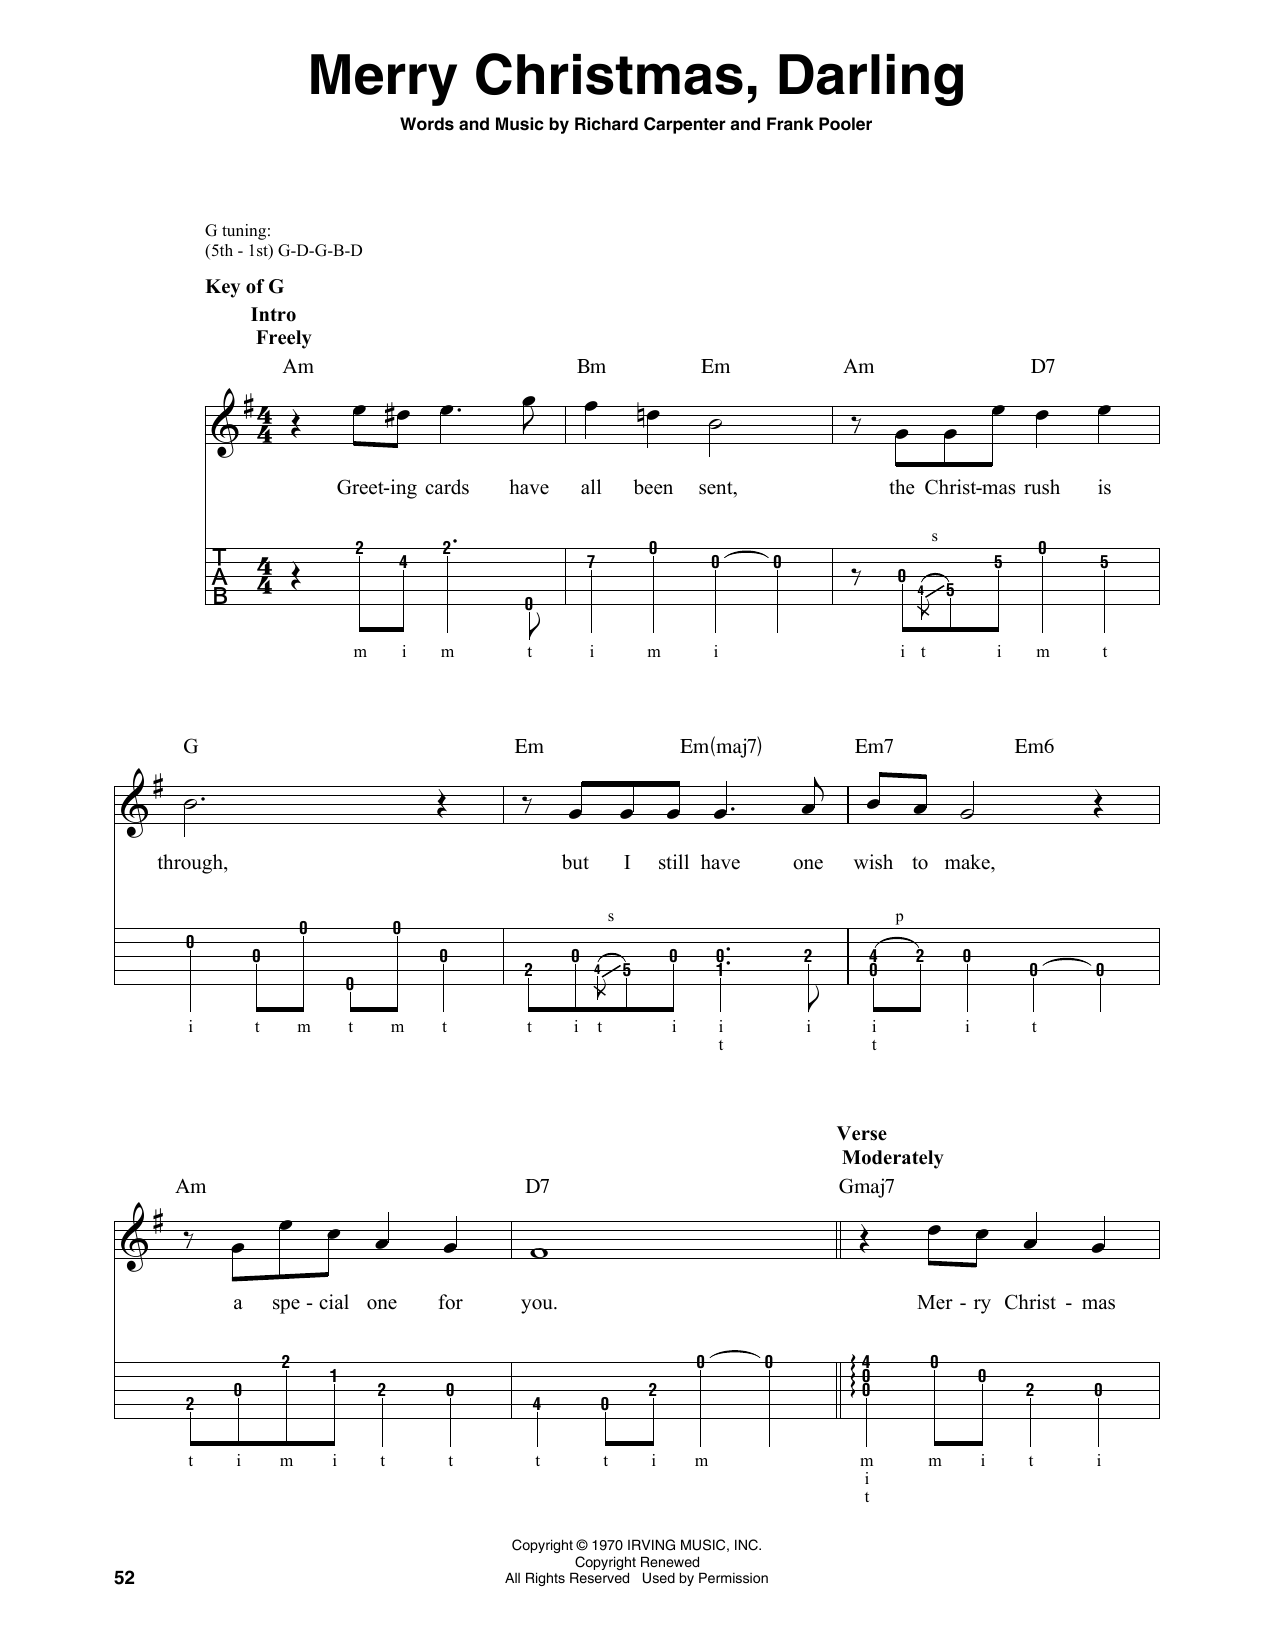 Merry Christmas, Darling Sheet Music